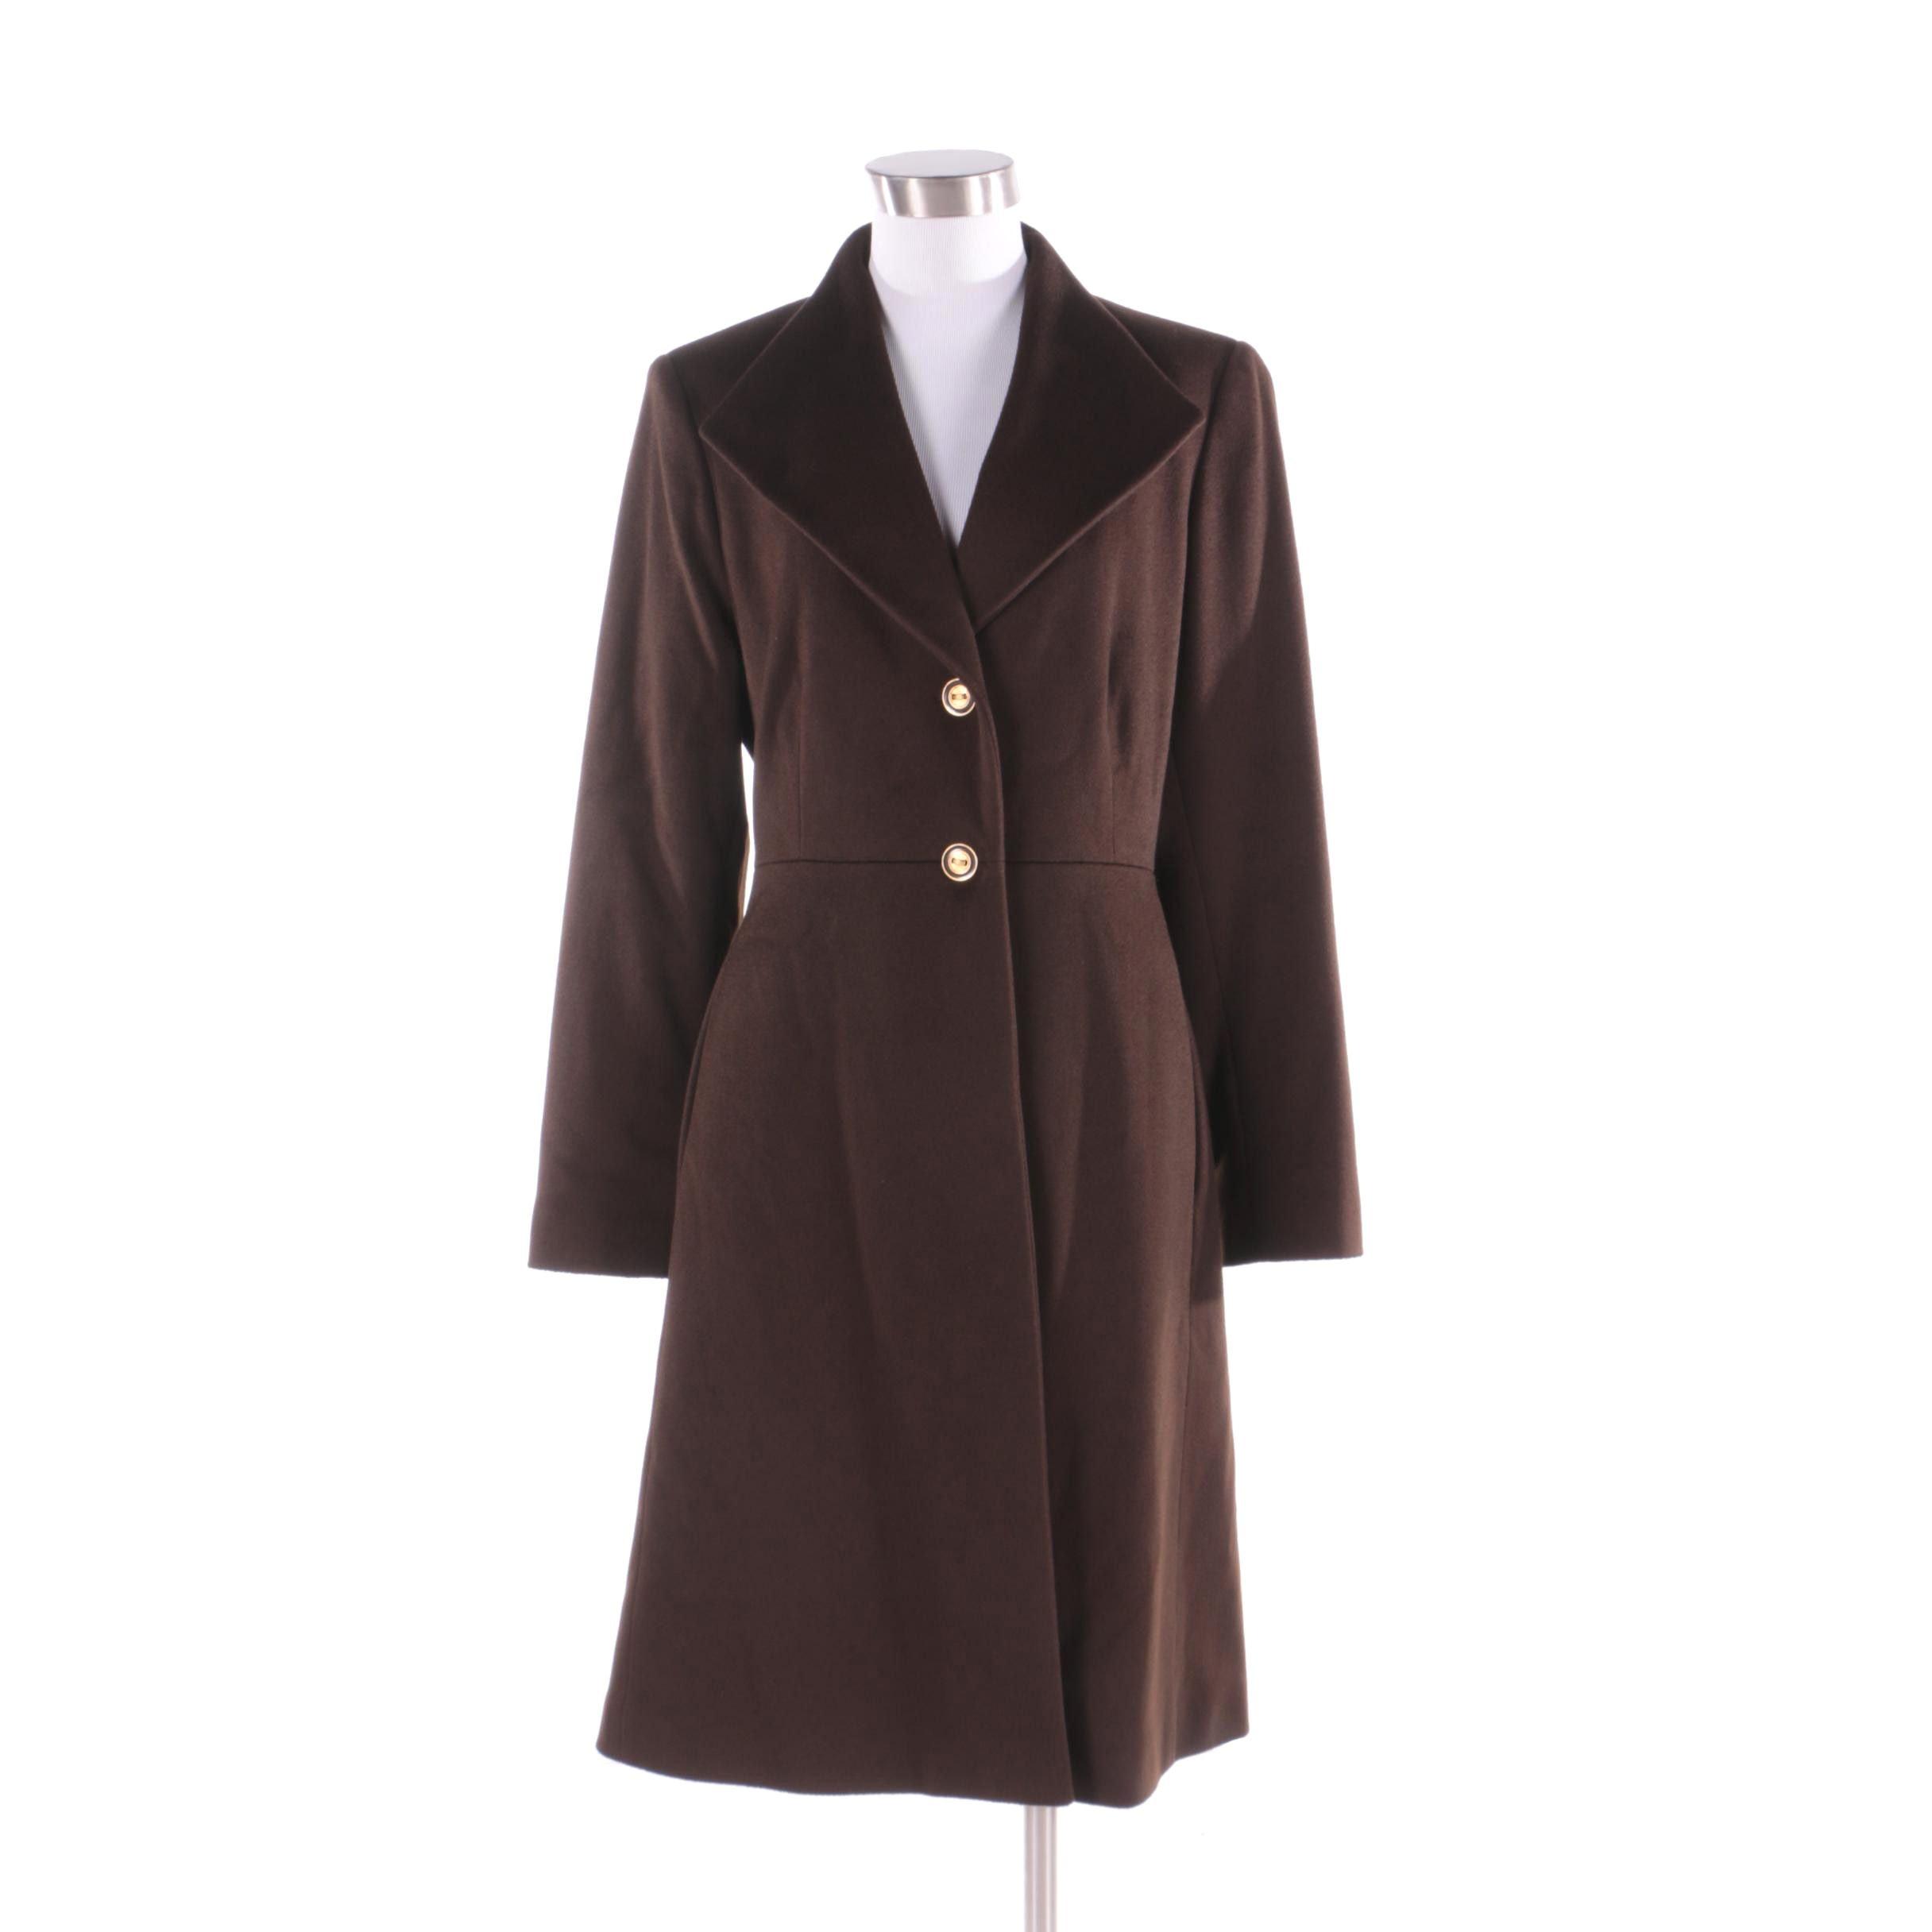 St. John Coats Brown Wool Coat